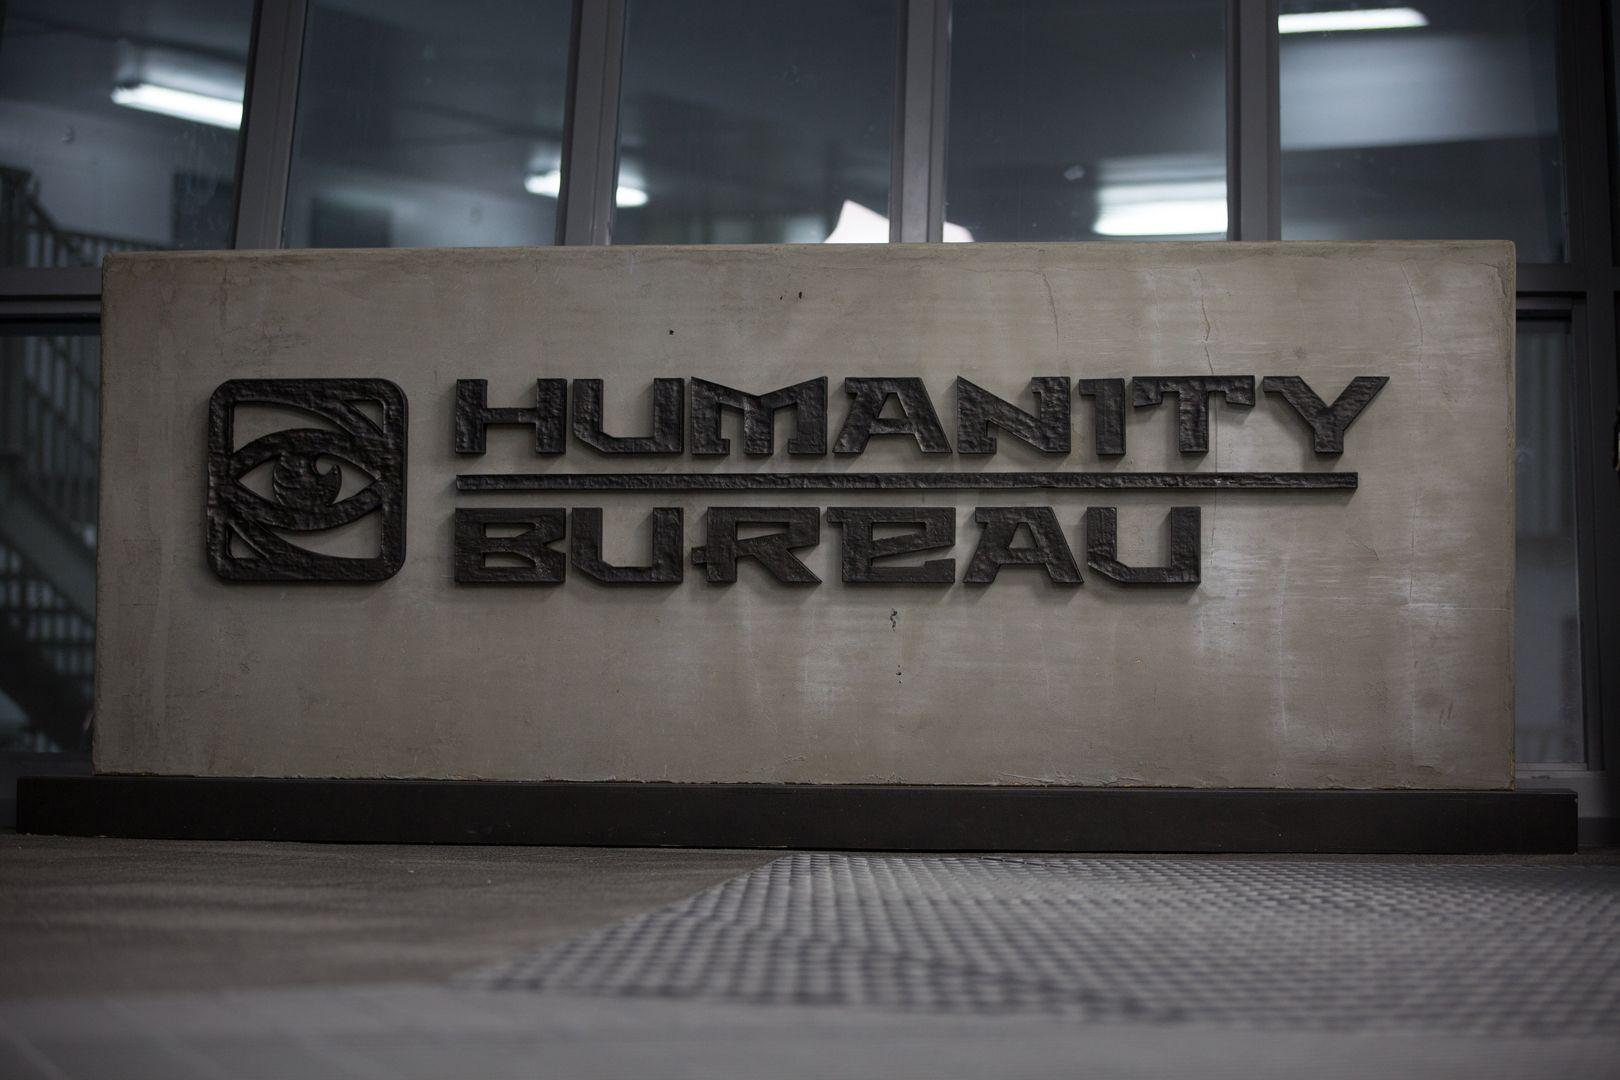 The humanity bureau movie starring nicolas cage teaser for Bureau movie